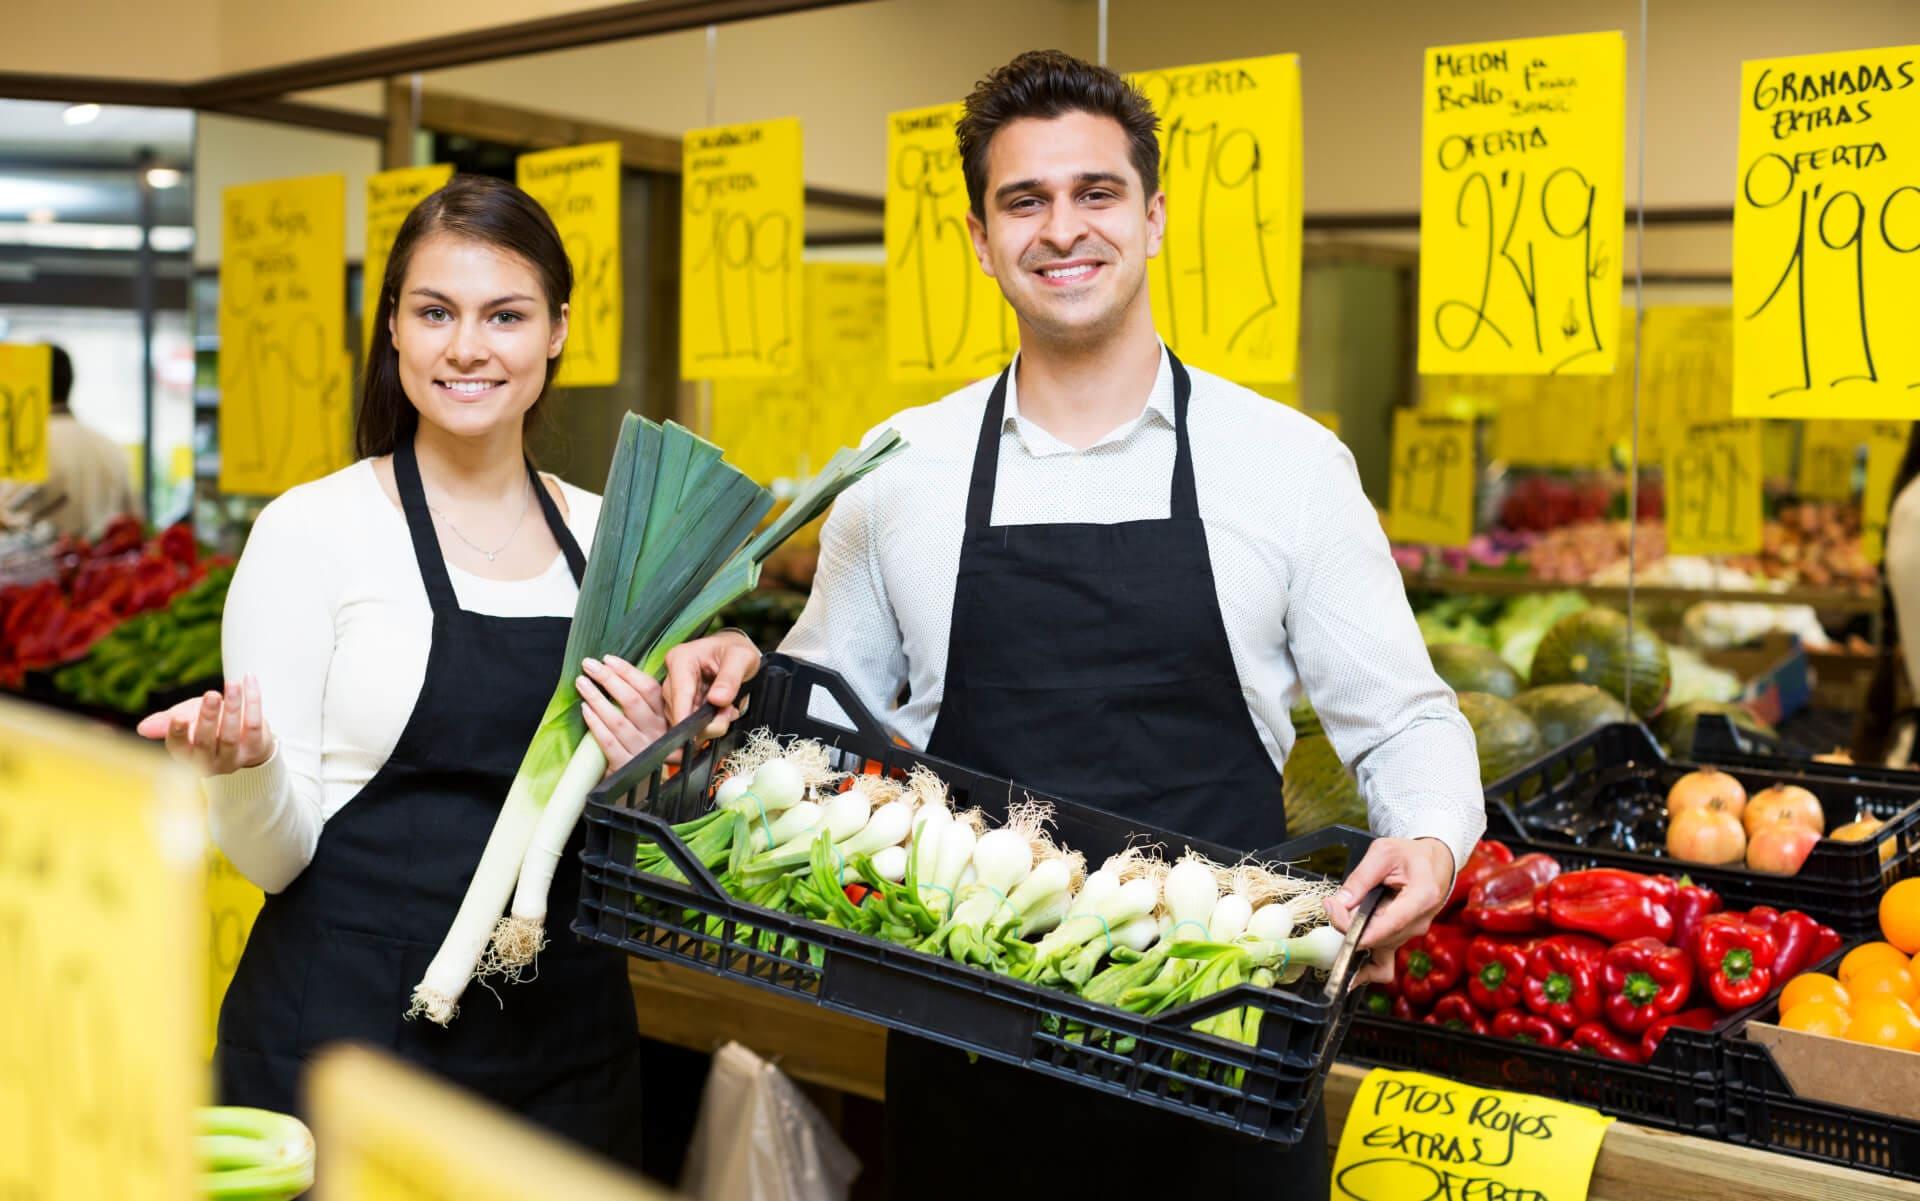 curso online gestao processos financeira marketing pessoas processos empresas empreendedor ead cmpe es